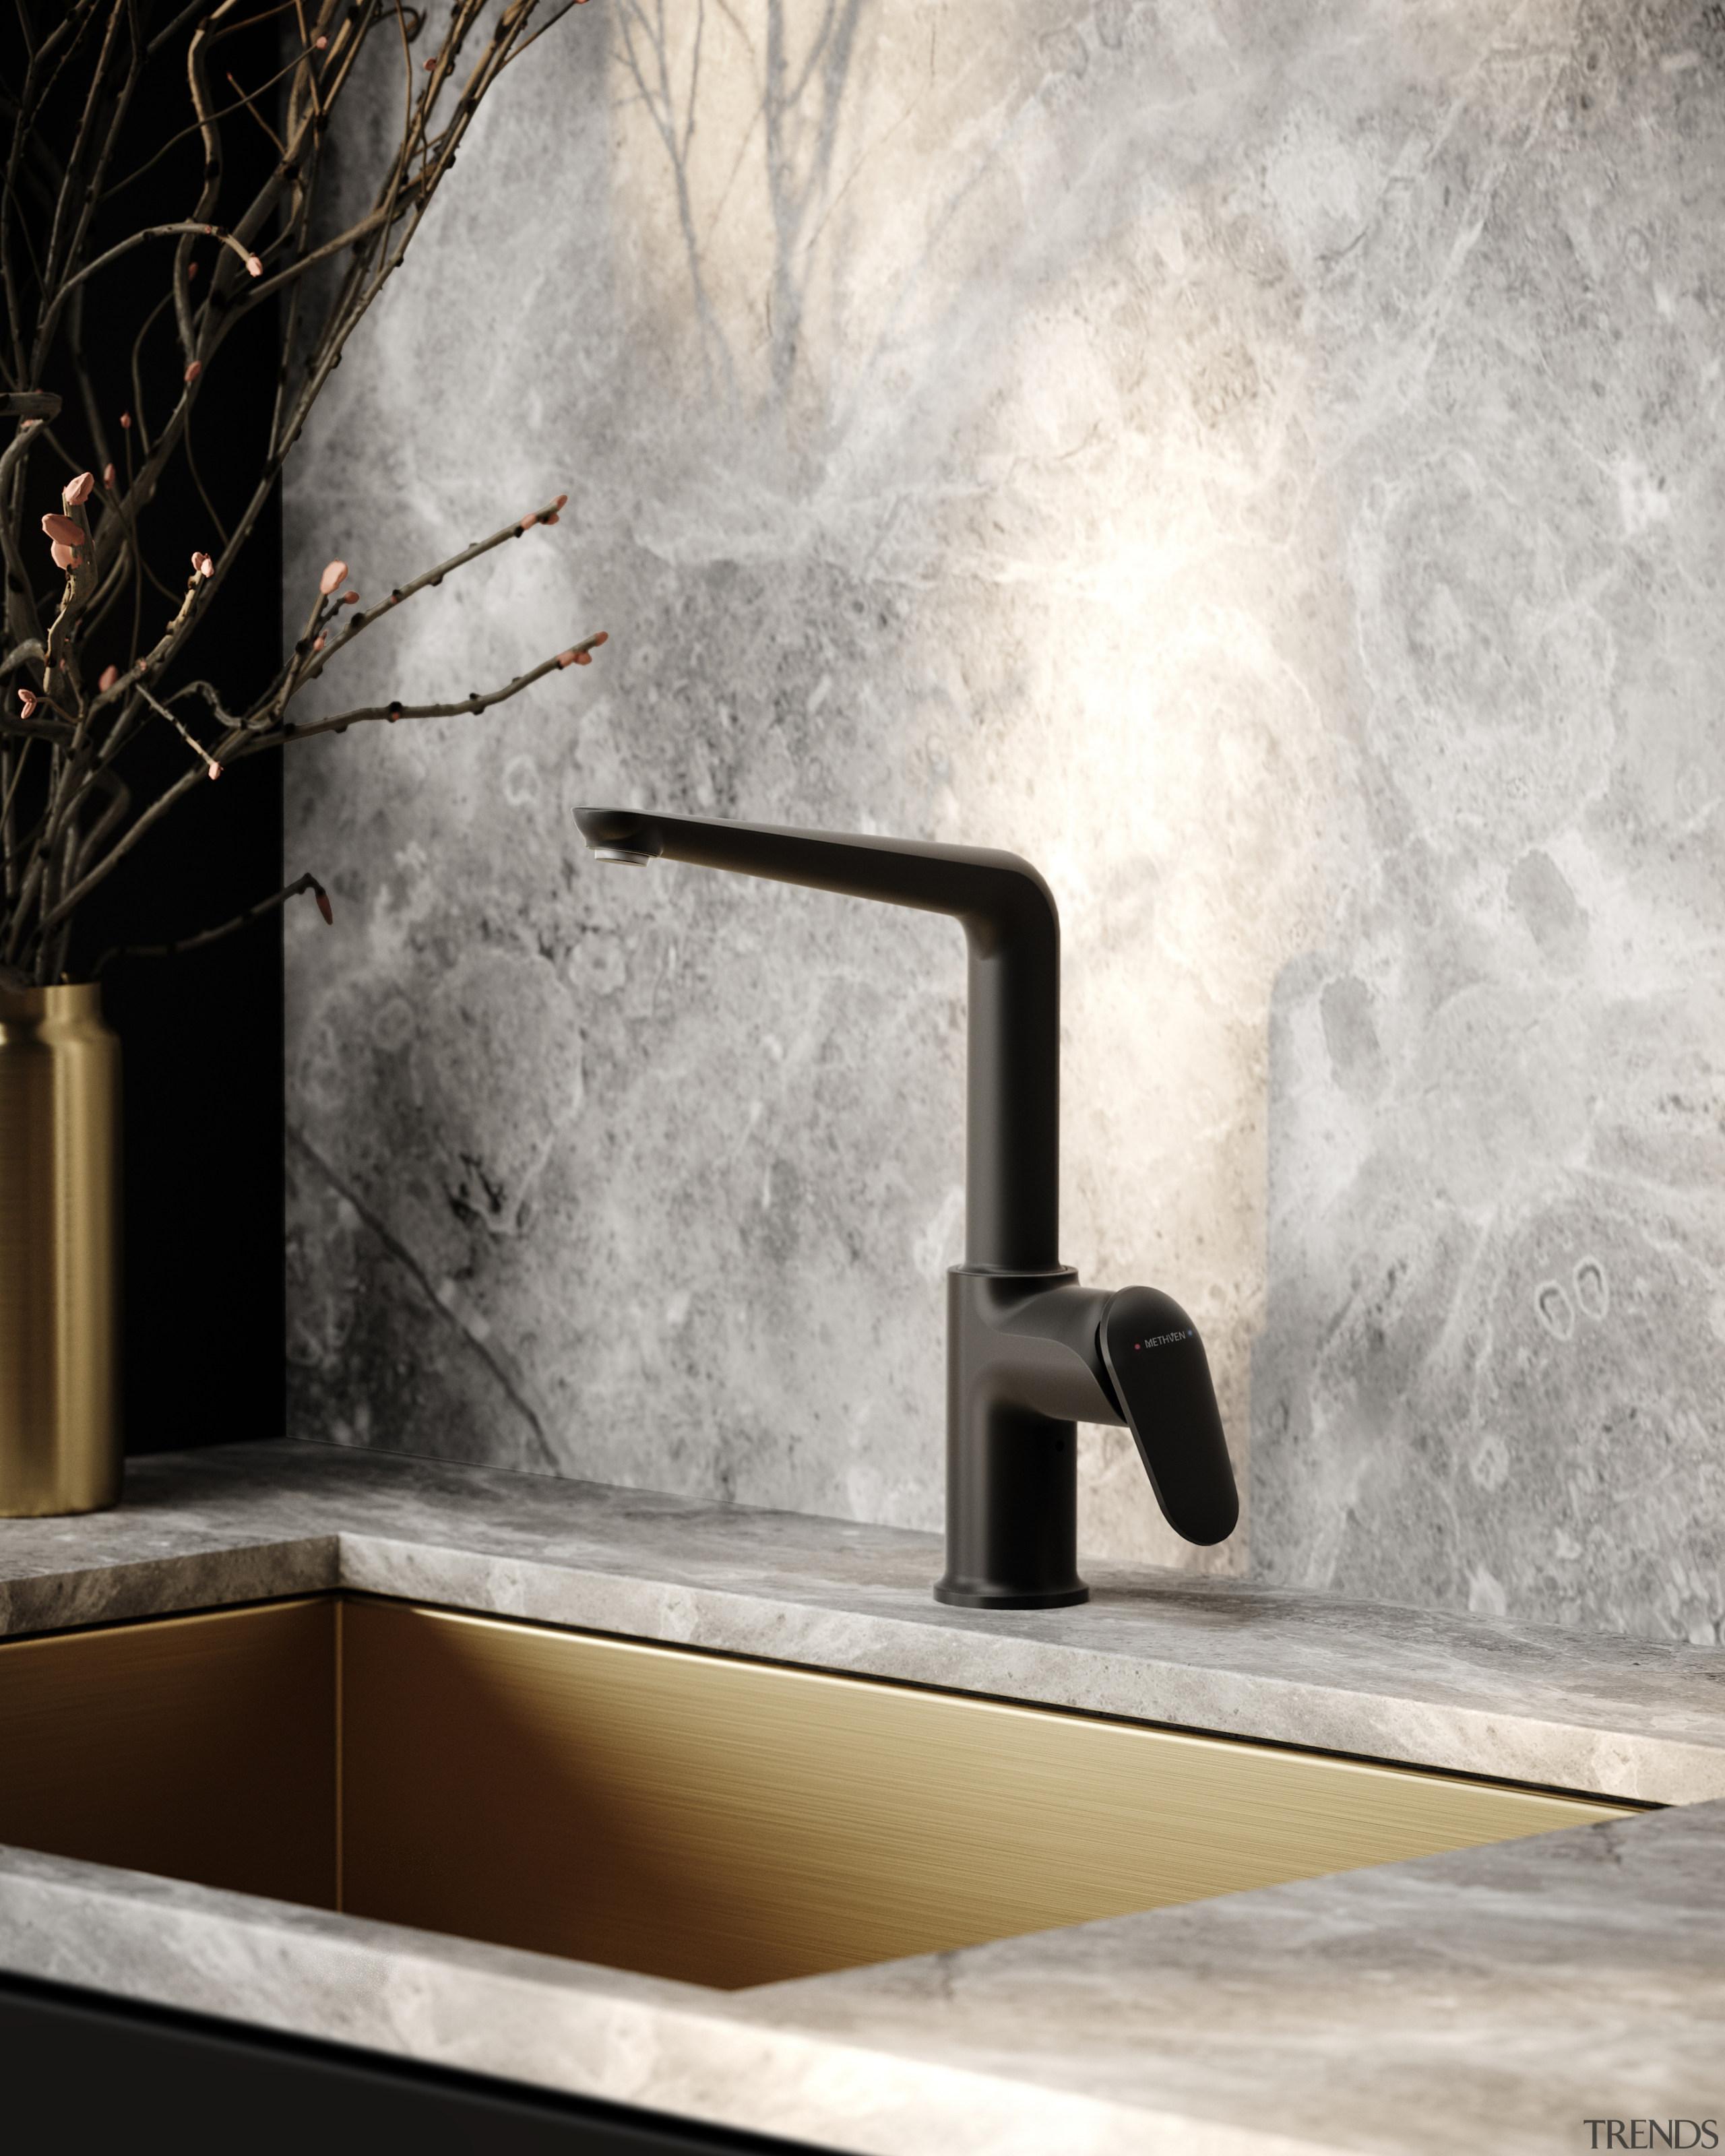 Sculpture on tap – the Aio Kitchen Mixer.